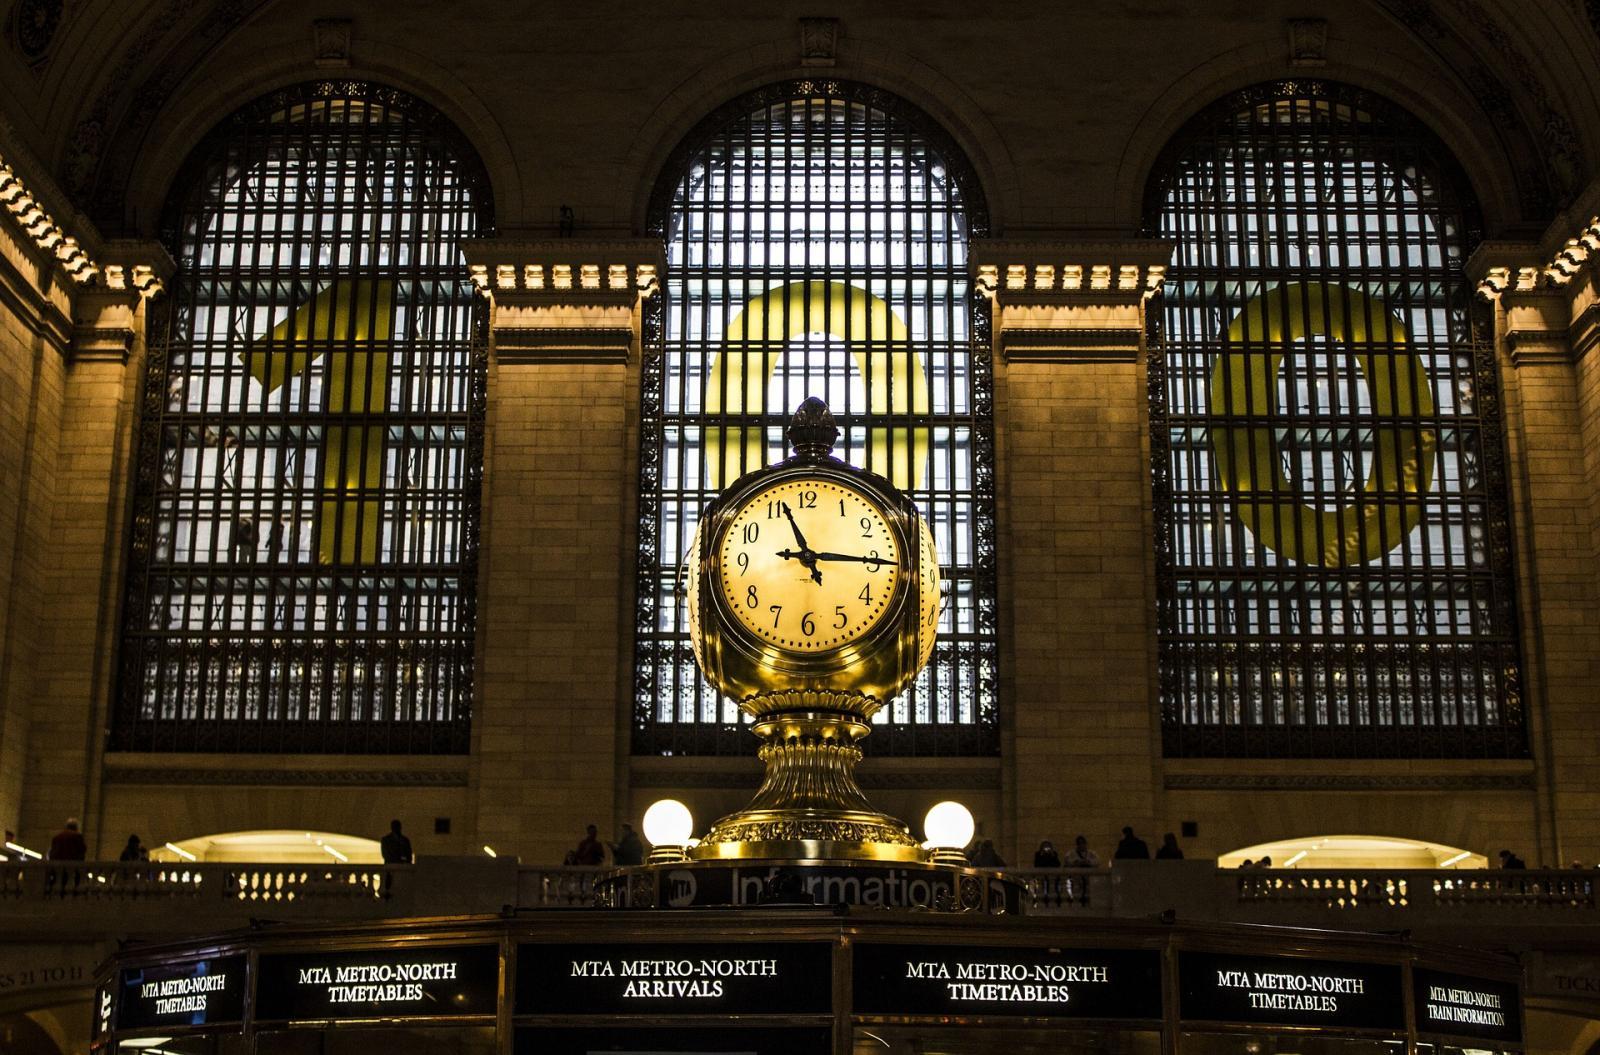 Grand Central Terminal Nueva York: centenario